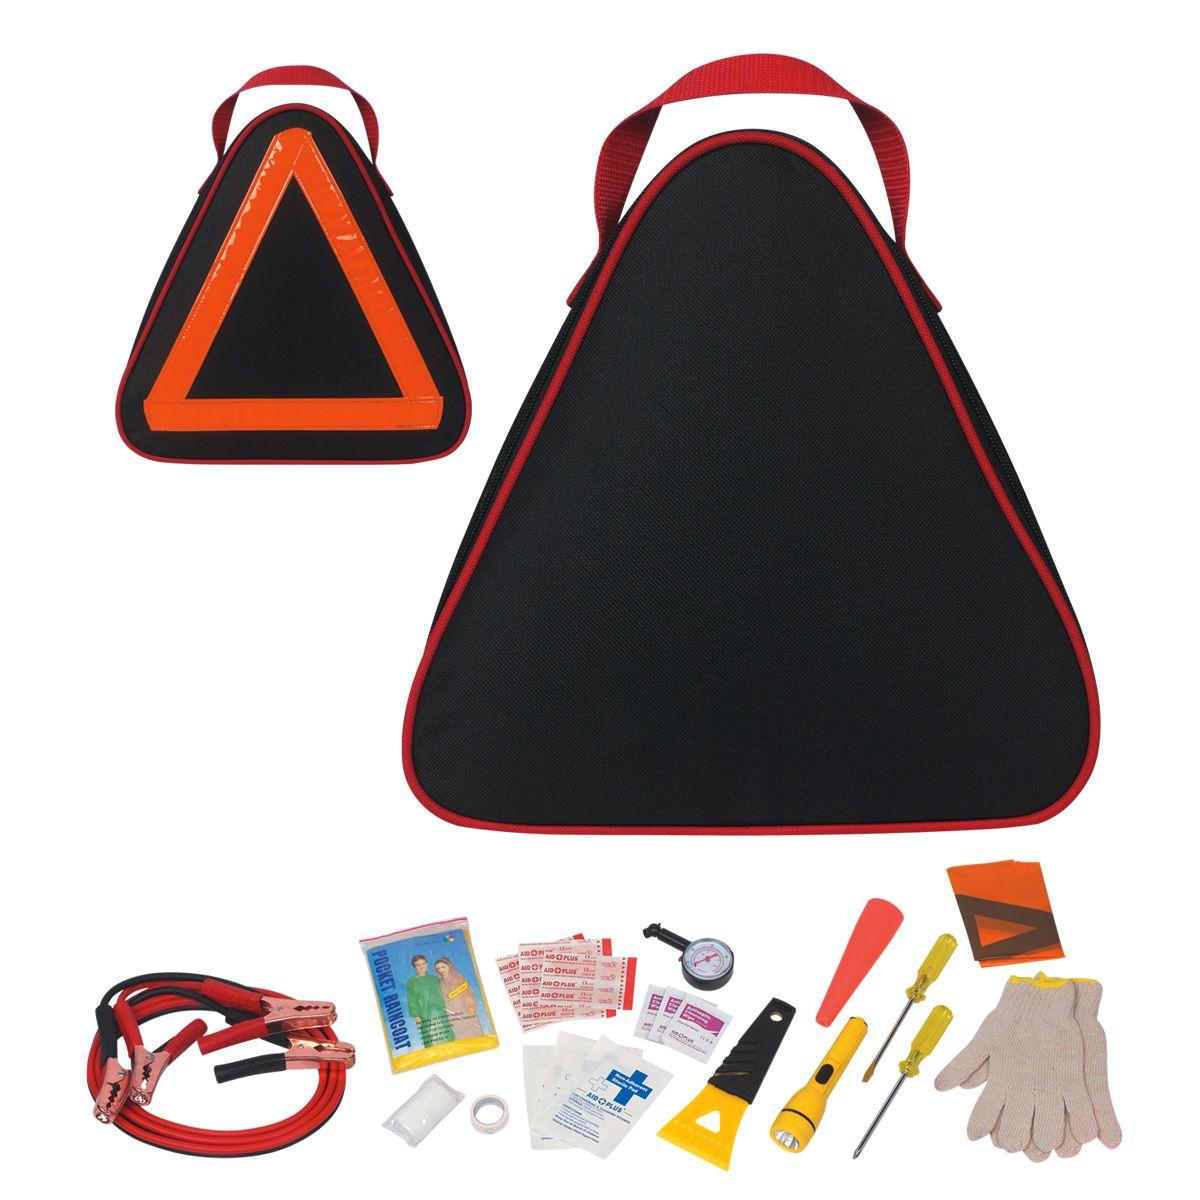 Auto Safety Tool